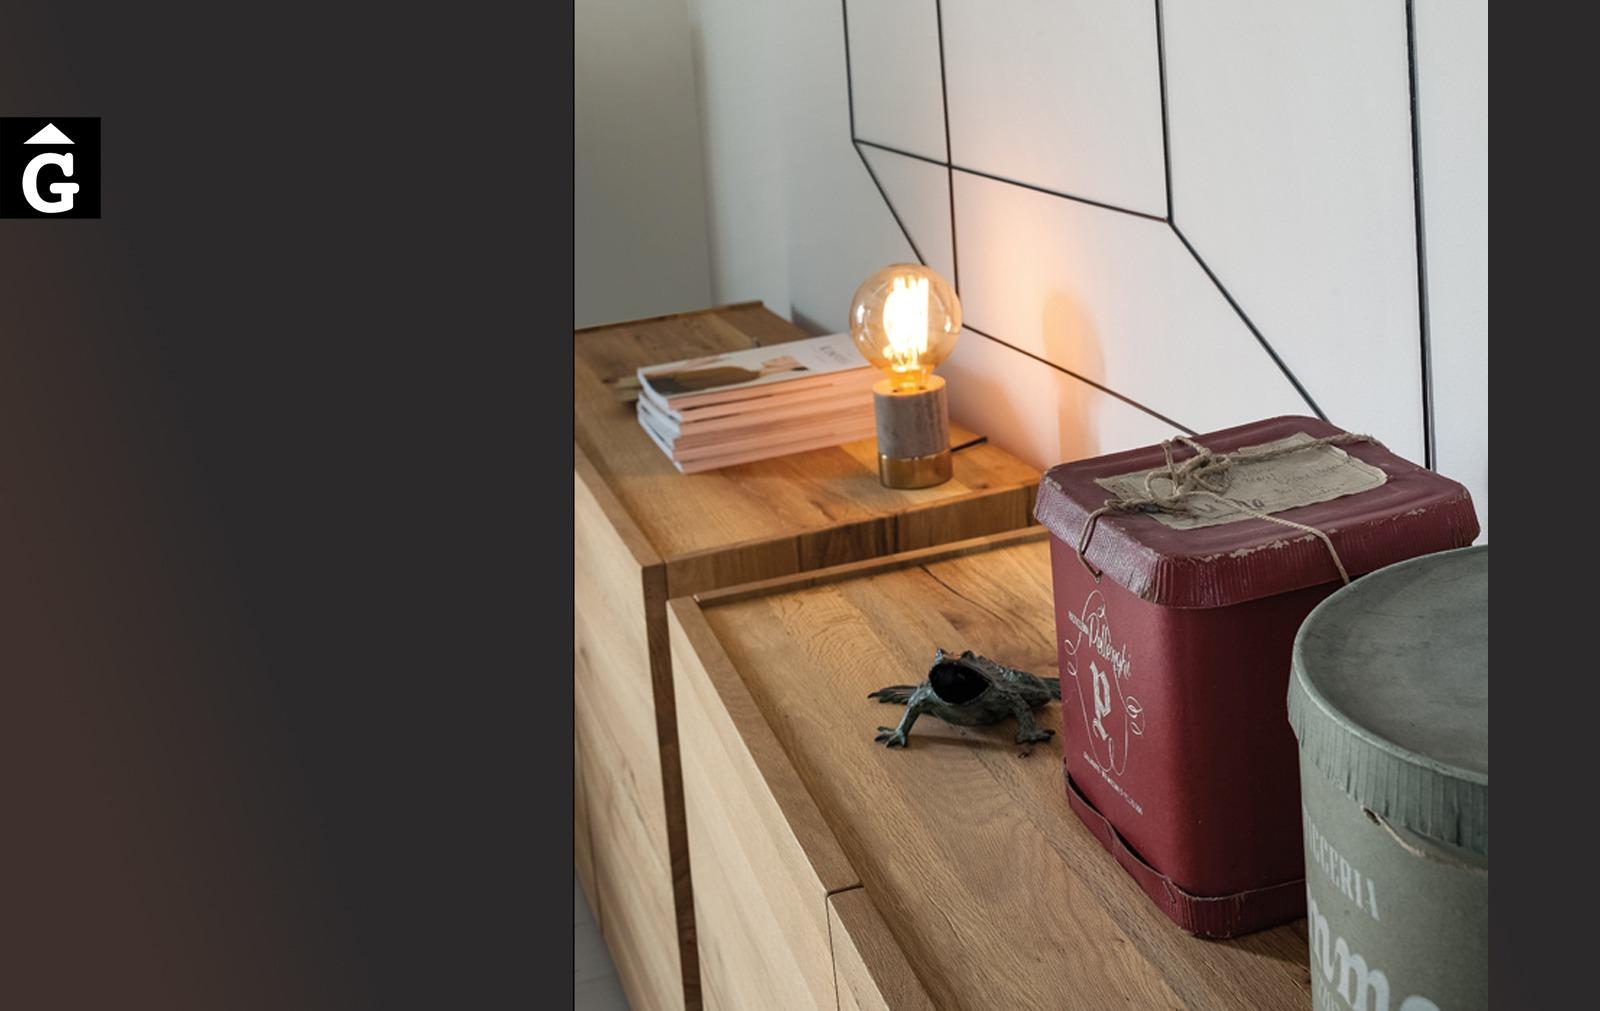 Moble Aparador Twins detall 1 M15 Devina Nais by mobles Gifreu moble massis roure disseny actual extremat qualitat premium